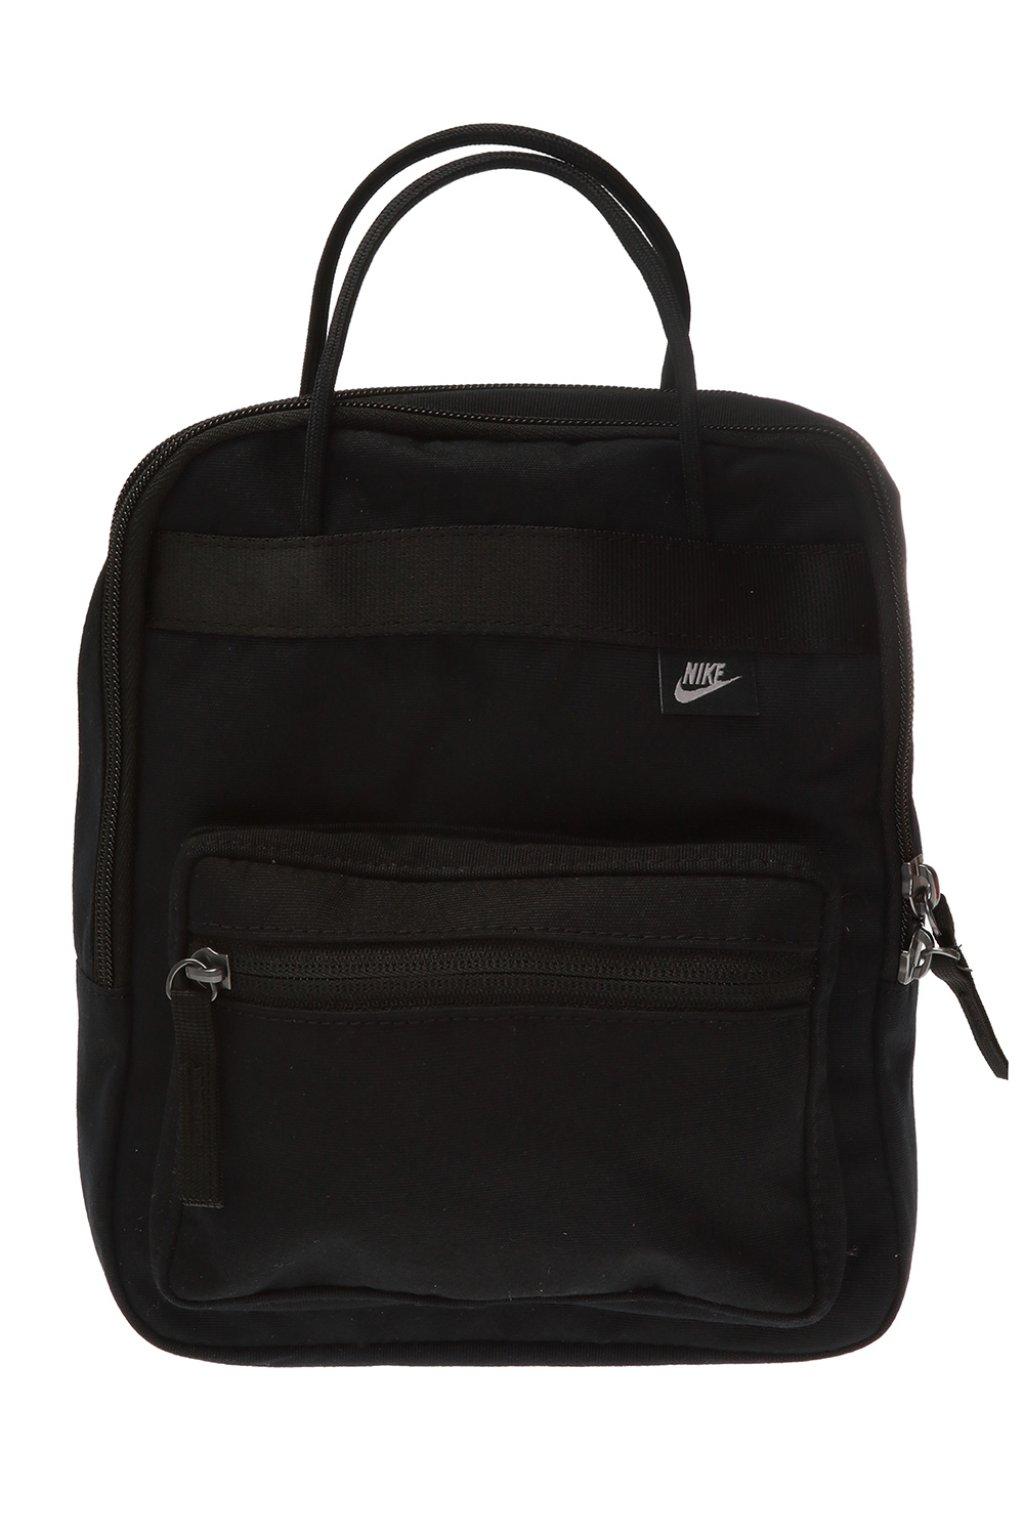 Nike 'Tanjun' backpack with logo